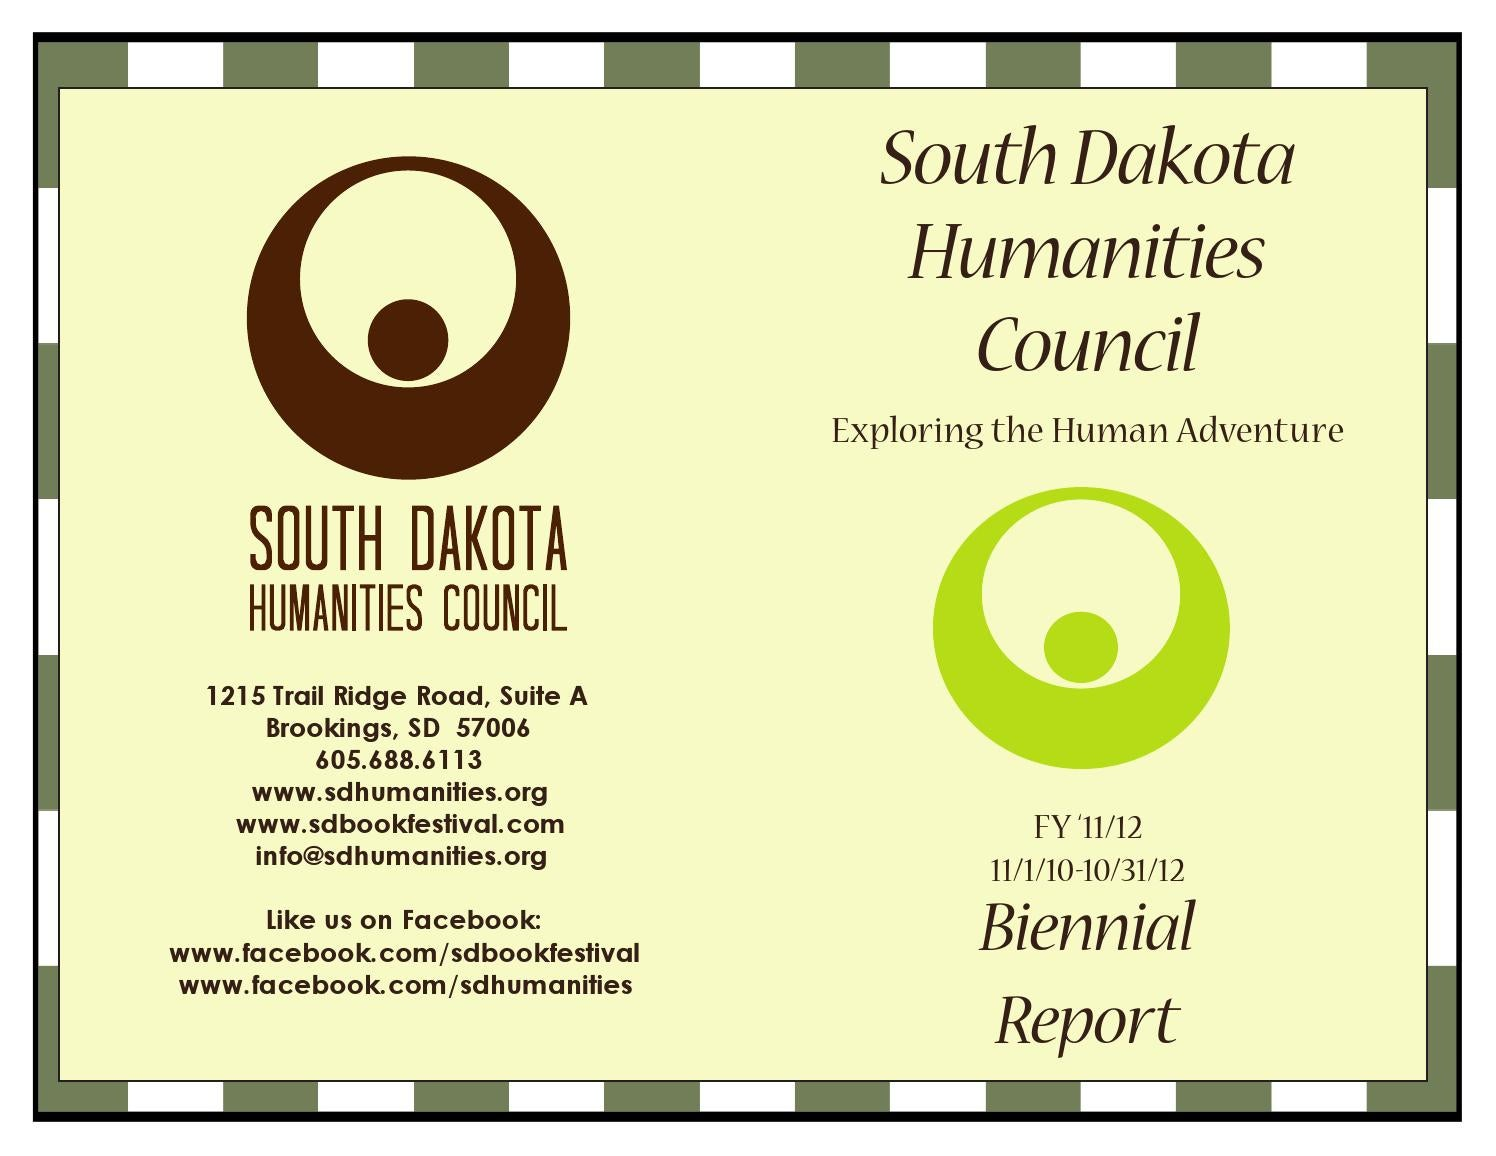 South dakota meade county howes - 2011 2012 Sdhc Biennial Report By South Dakota Humanities Council Issuu